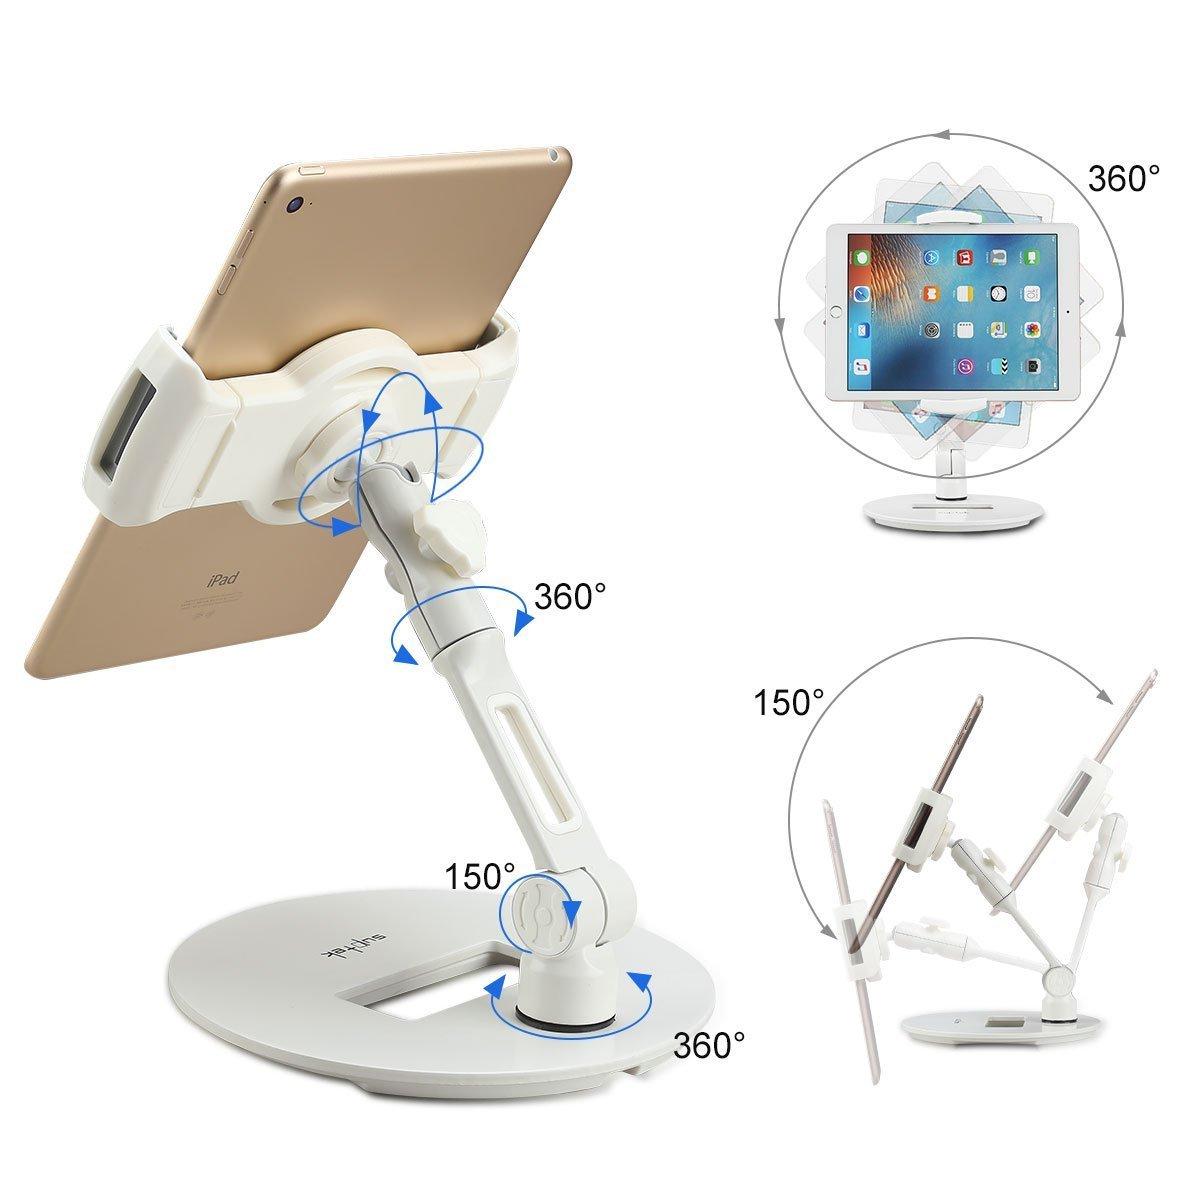 Soporte Para Tableta Soporte Para Teléfono Celular Ajustable Soporte Para ángulo Múltiple Soporte Para Soporte Para Escritorio Tableta Y tableta Smartphone ...